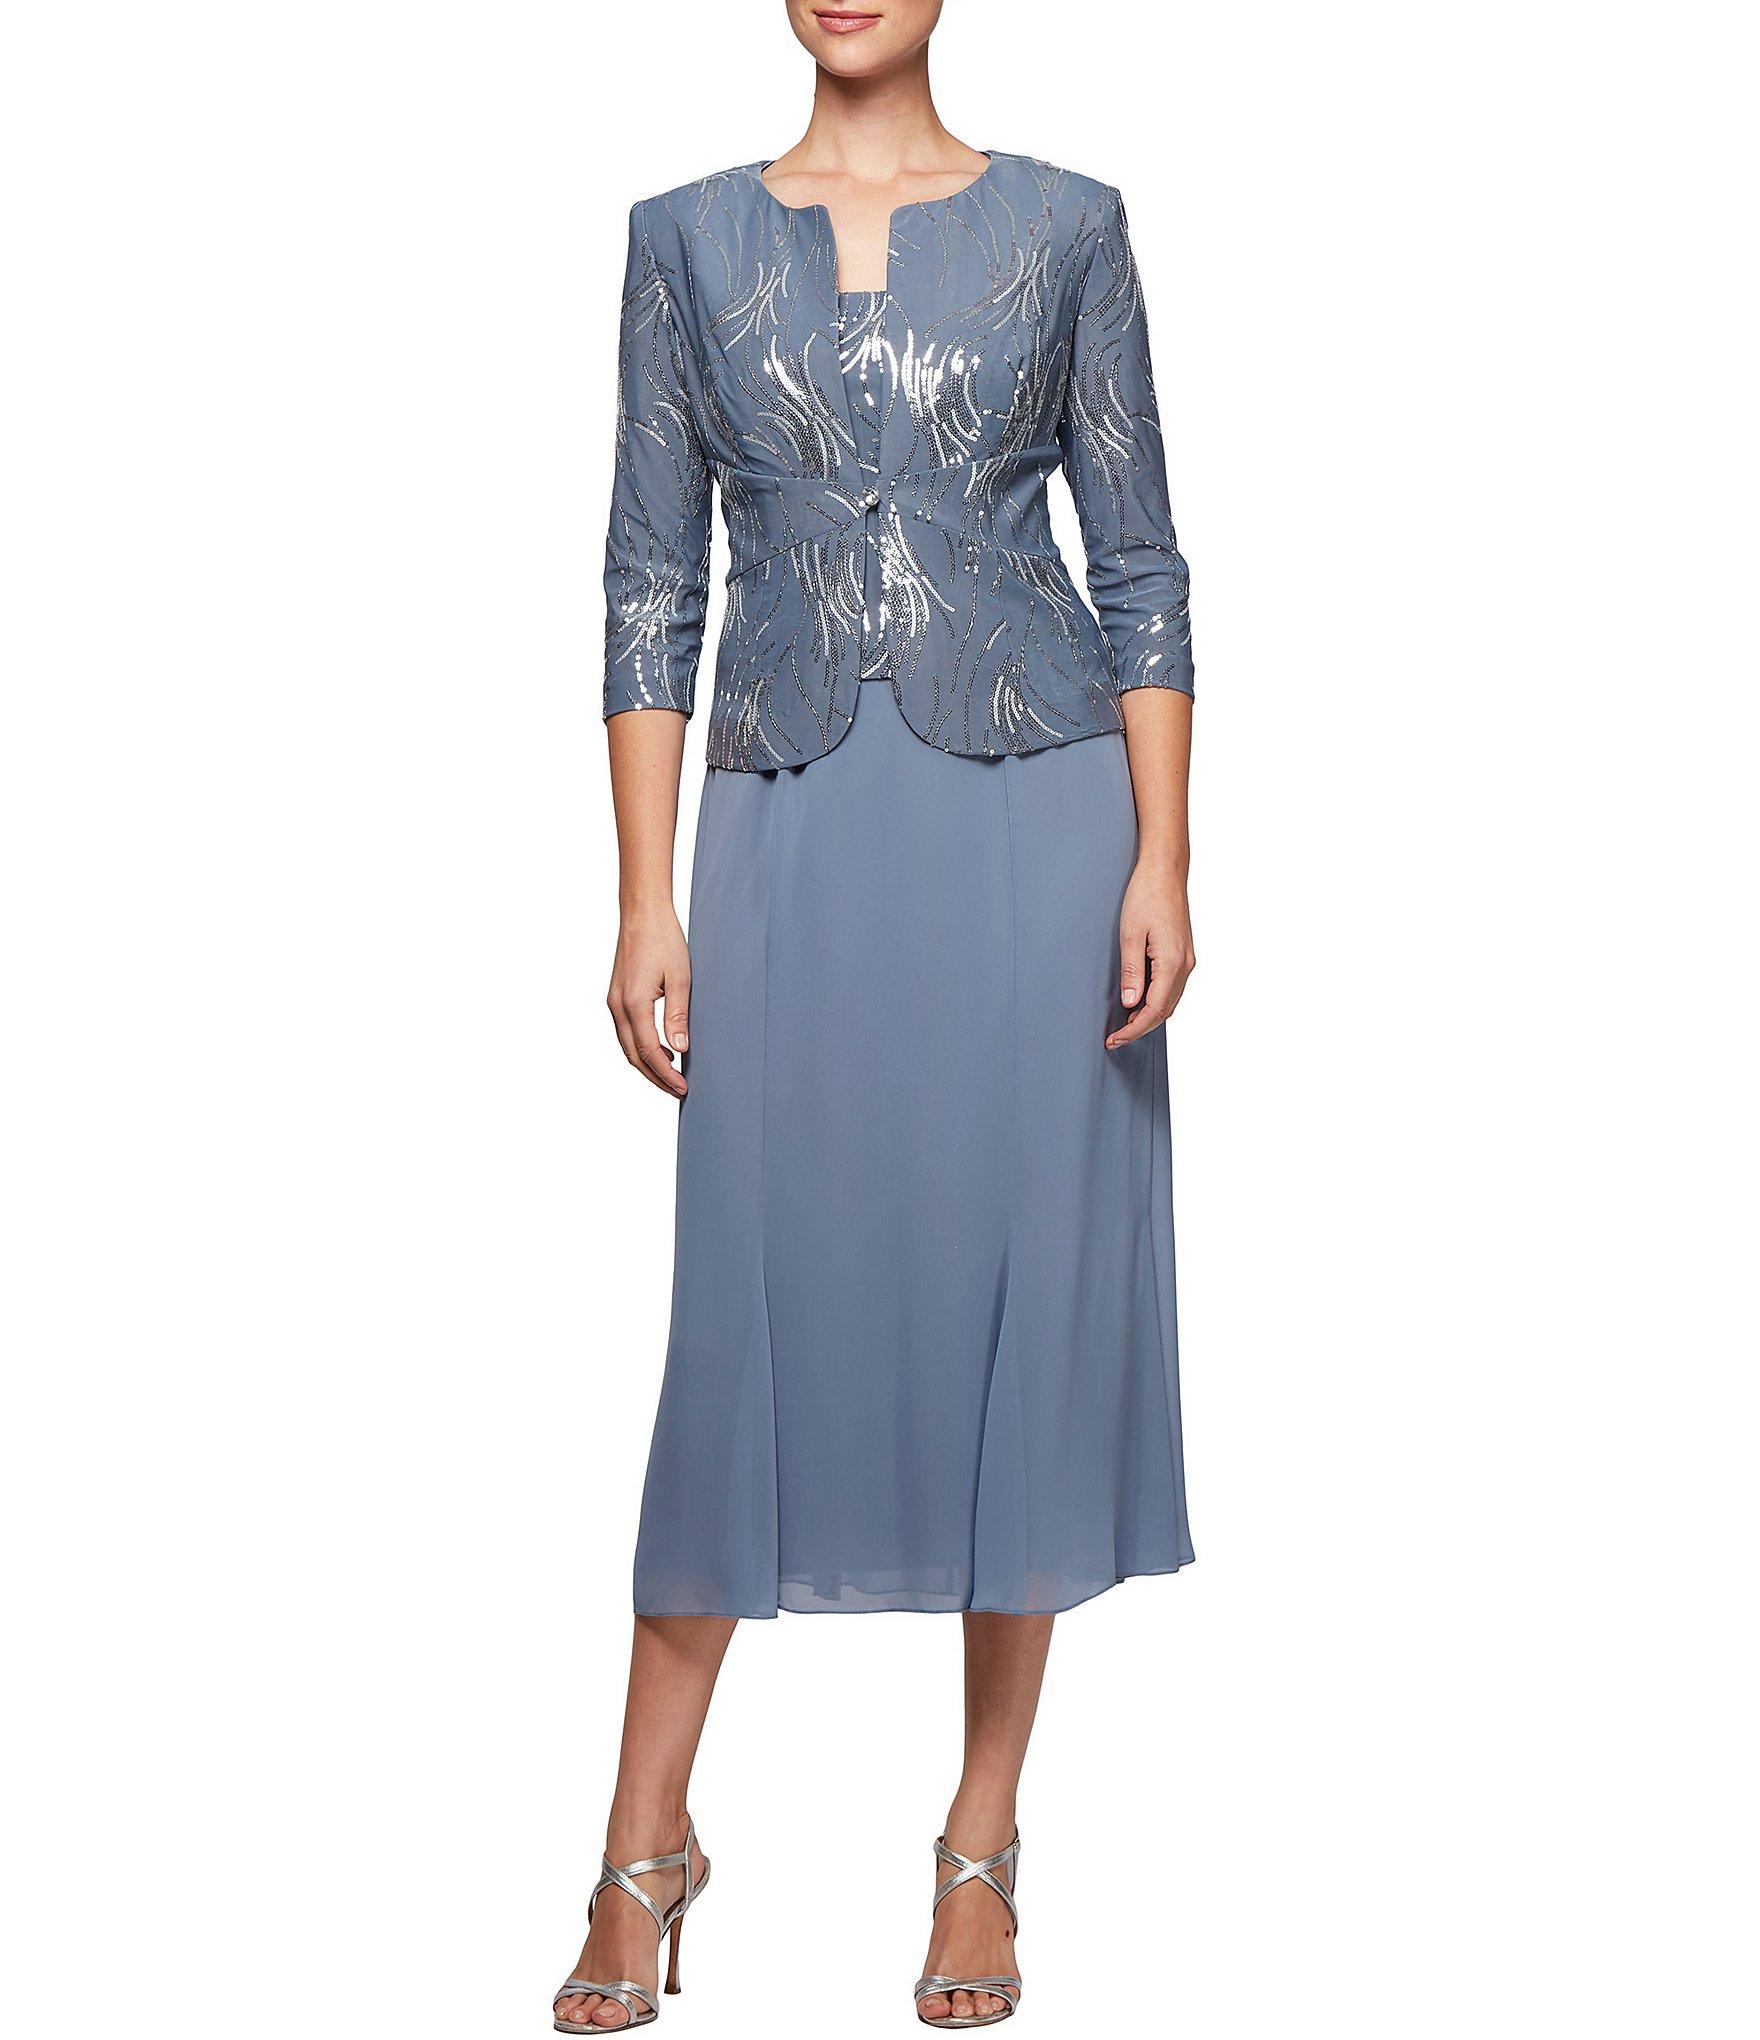 ca8b97b09a74a Petite Cocktail & Party Dresses | Dillard's